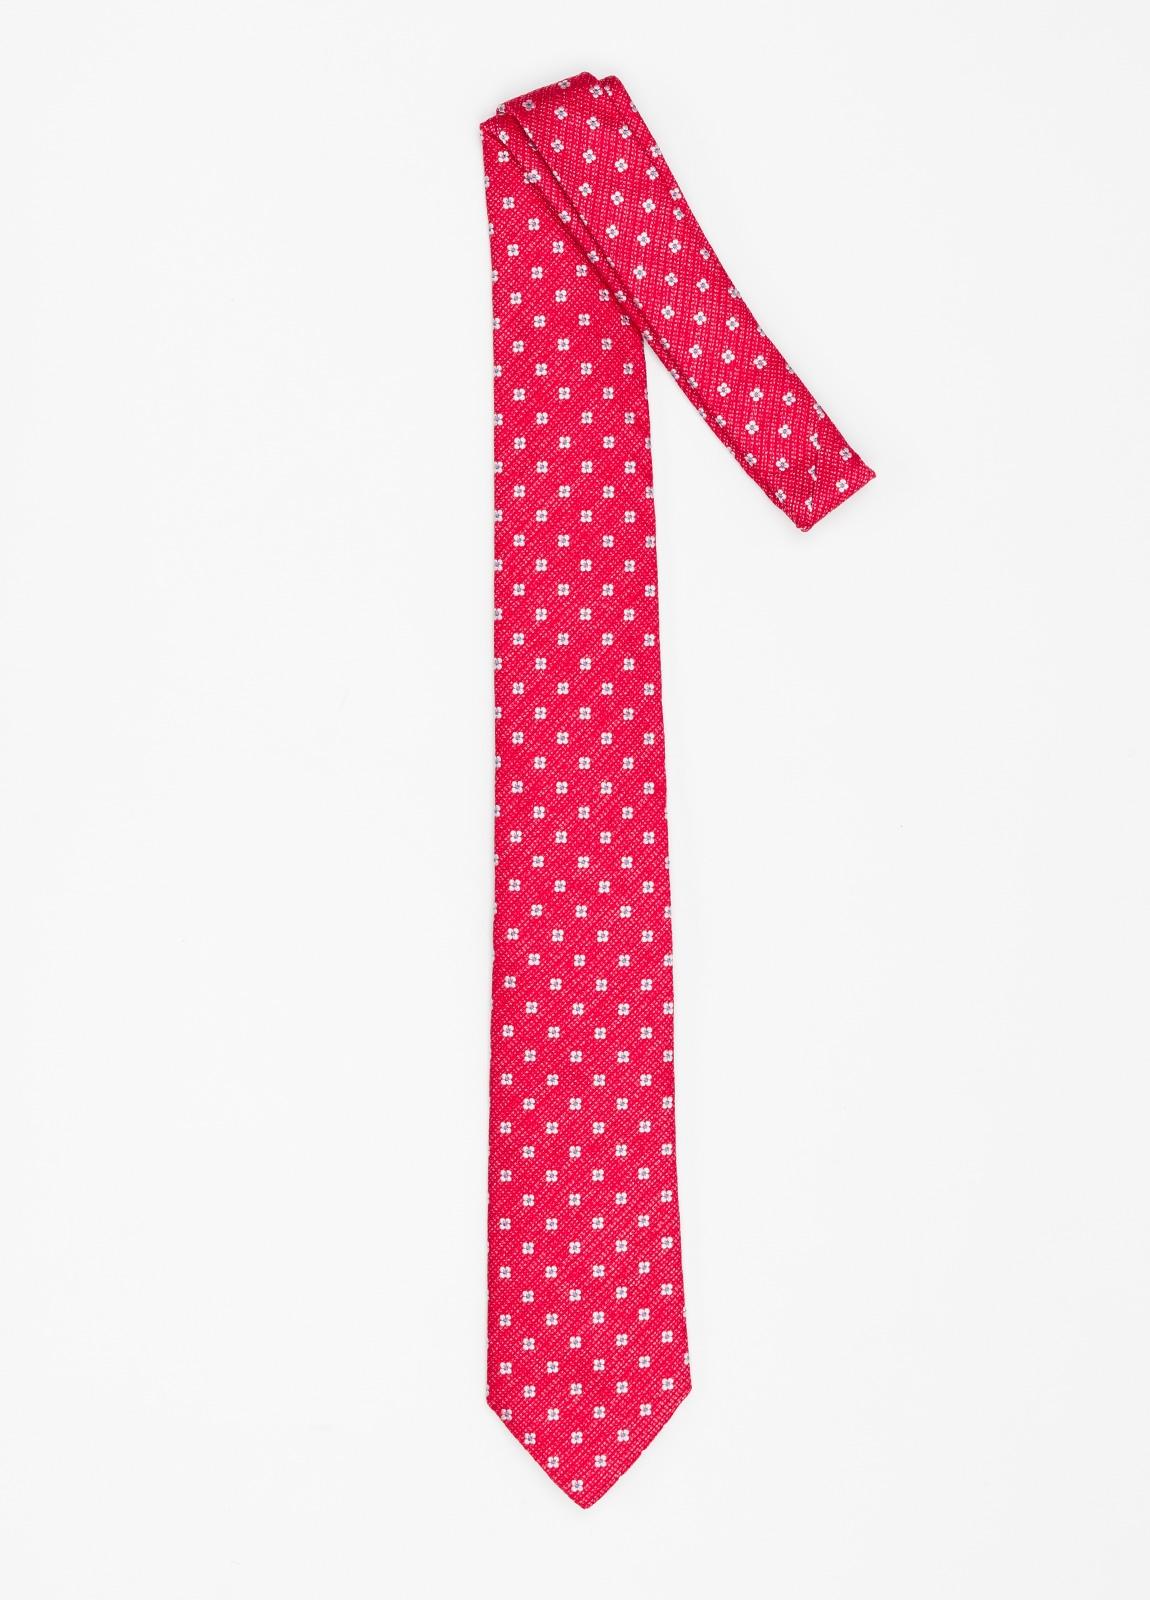 Corbata Formal Wear micro textura flor color rojo. Pala 7,5 cm. 100% Seda. - Ítem1